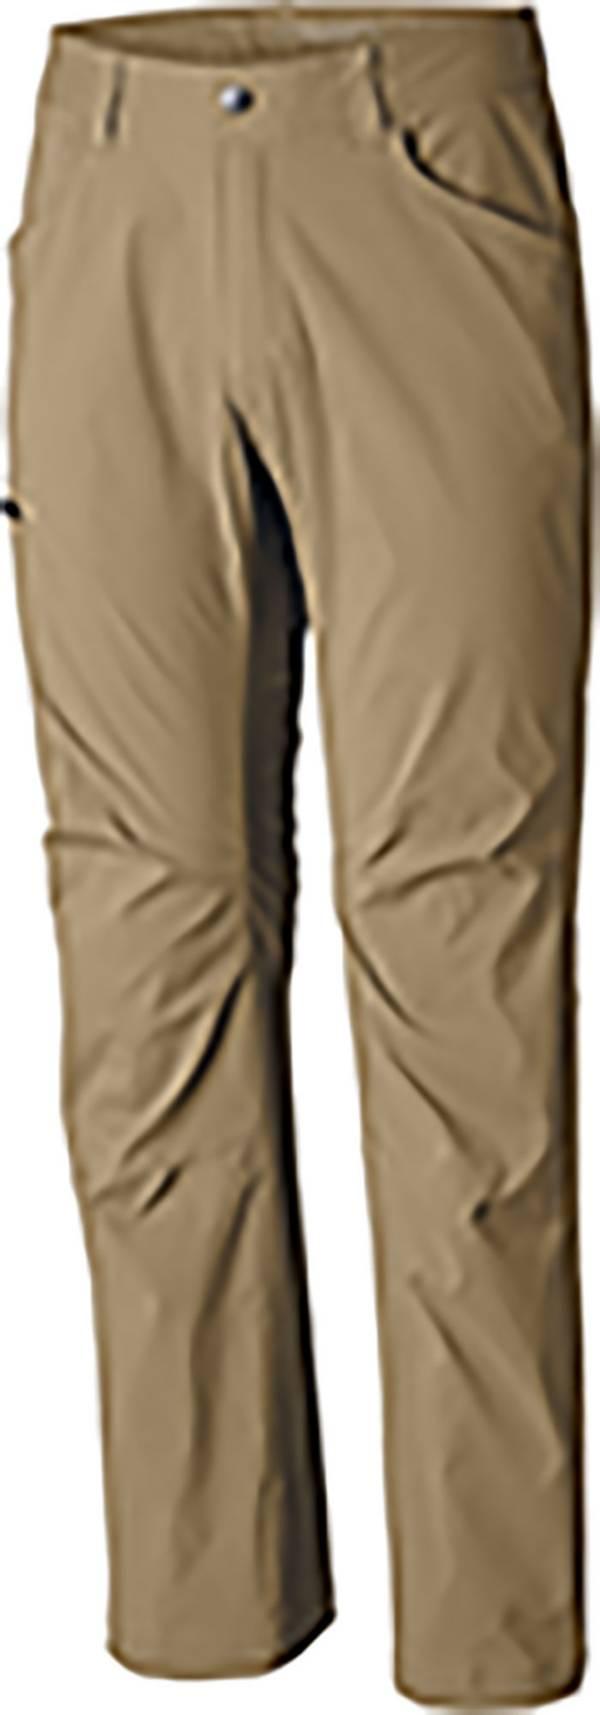 Columbia Men's Silver Ridge II Stretch Pants (Regular and Big & Tall) product image